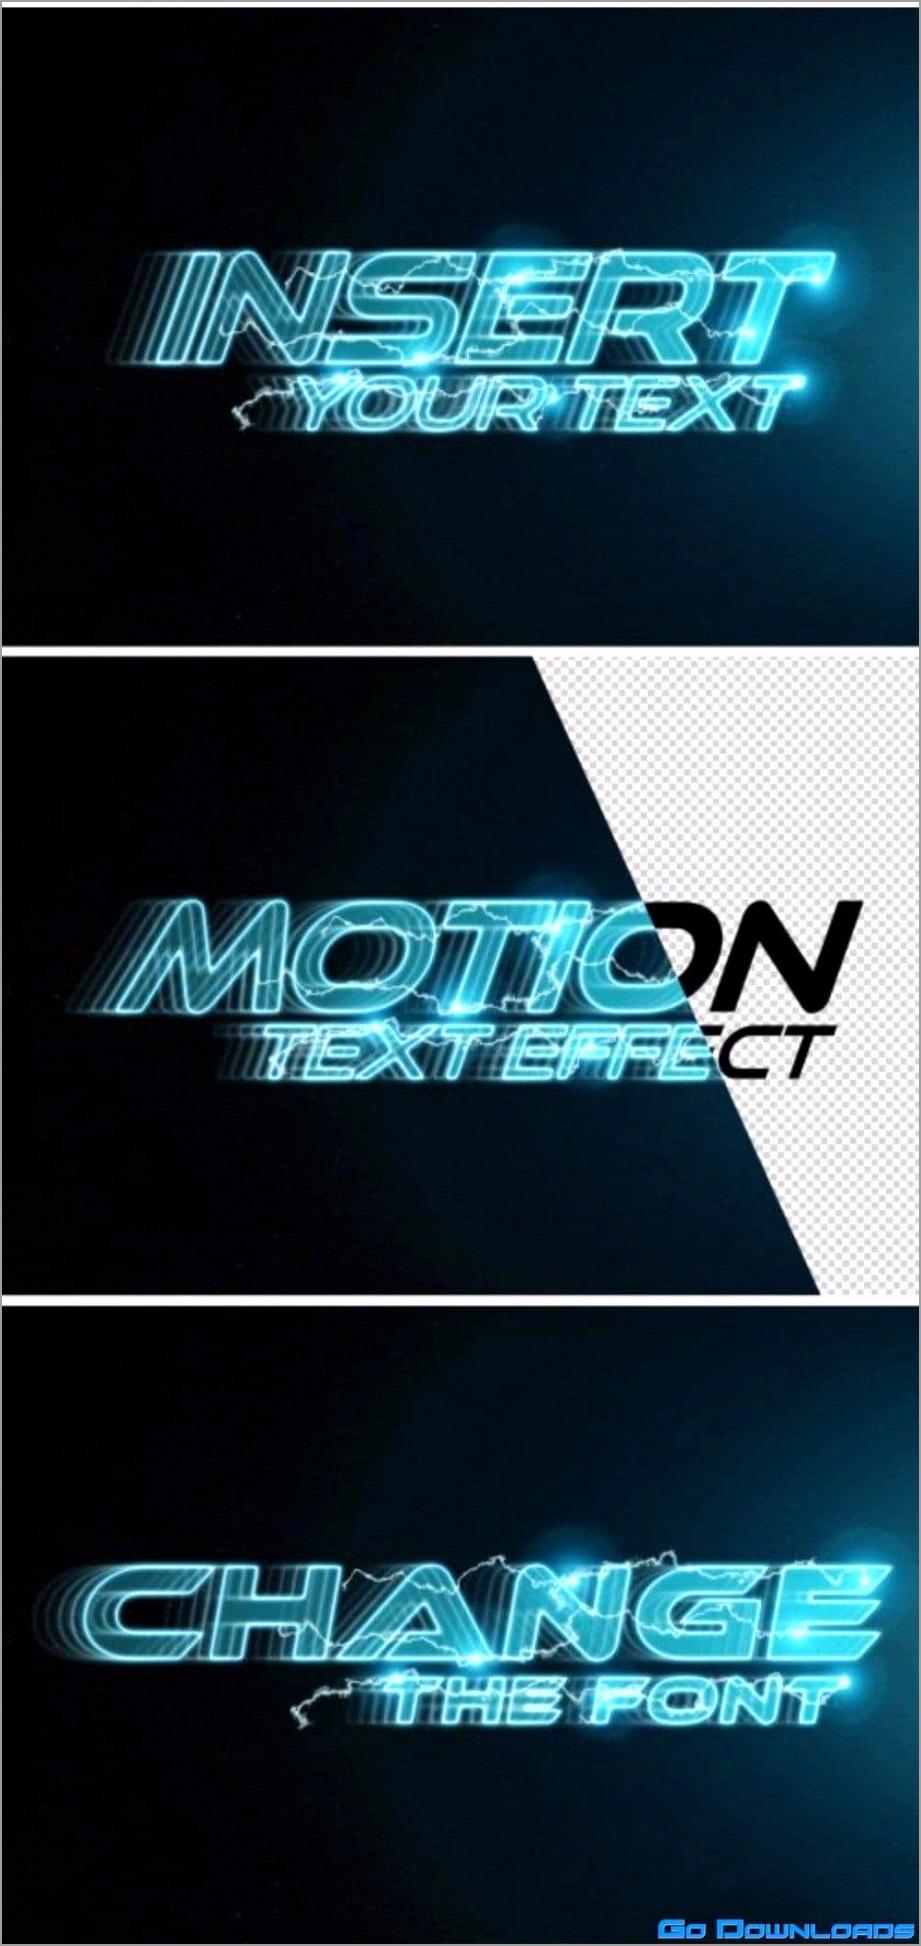 in motion text effect mockup free uwiui